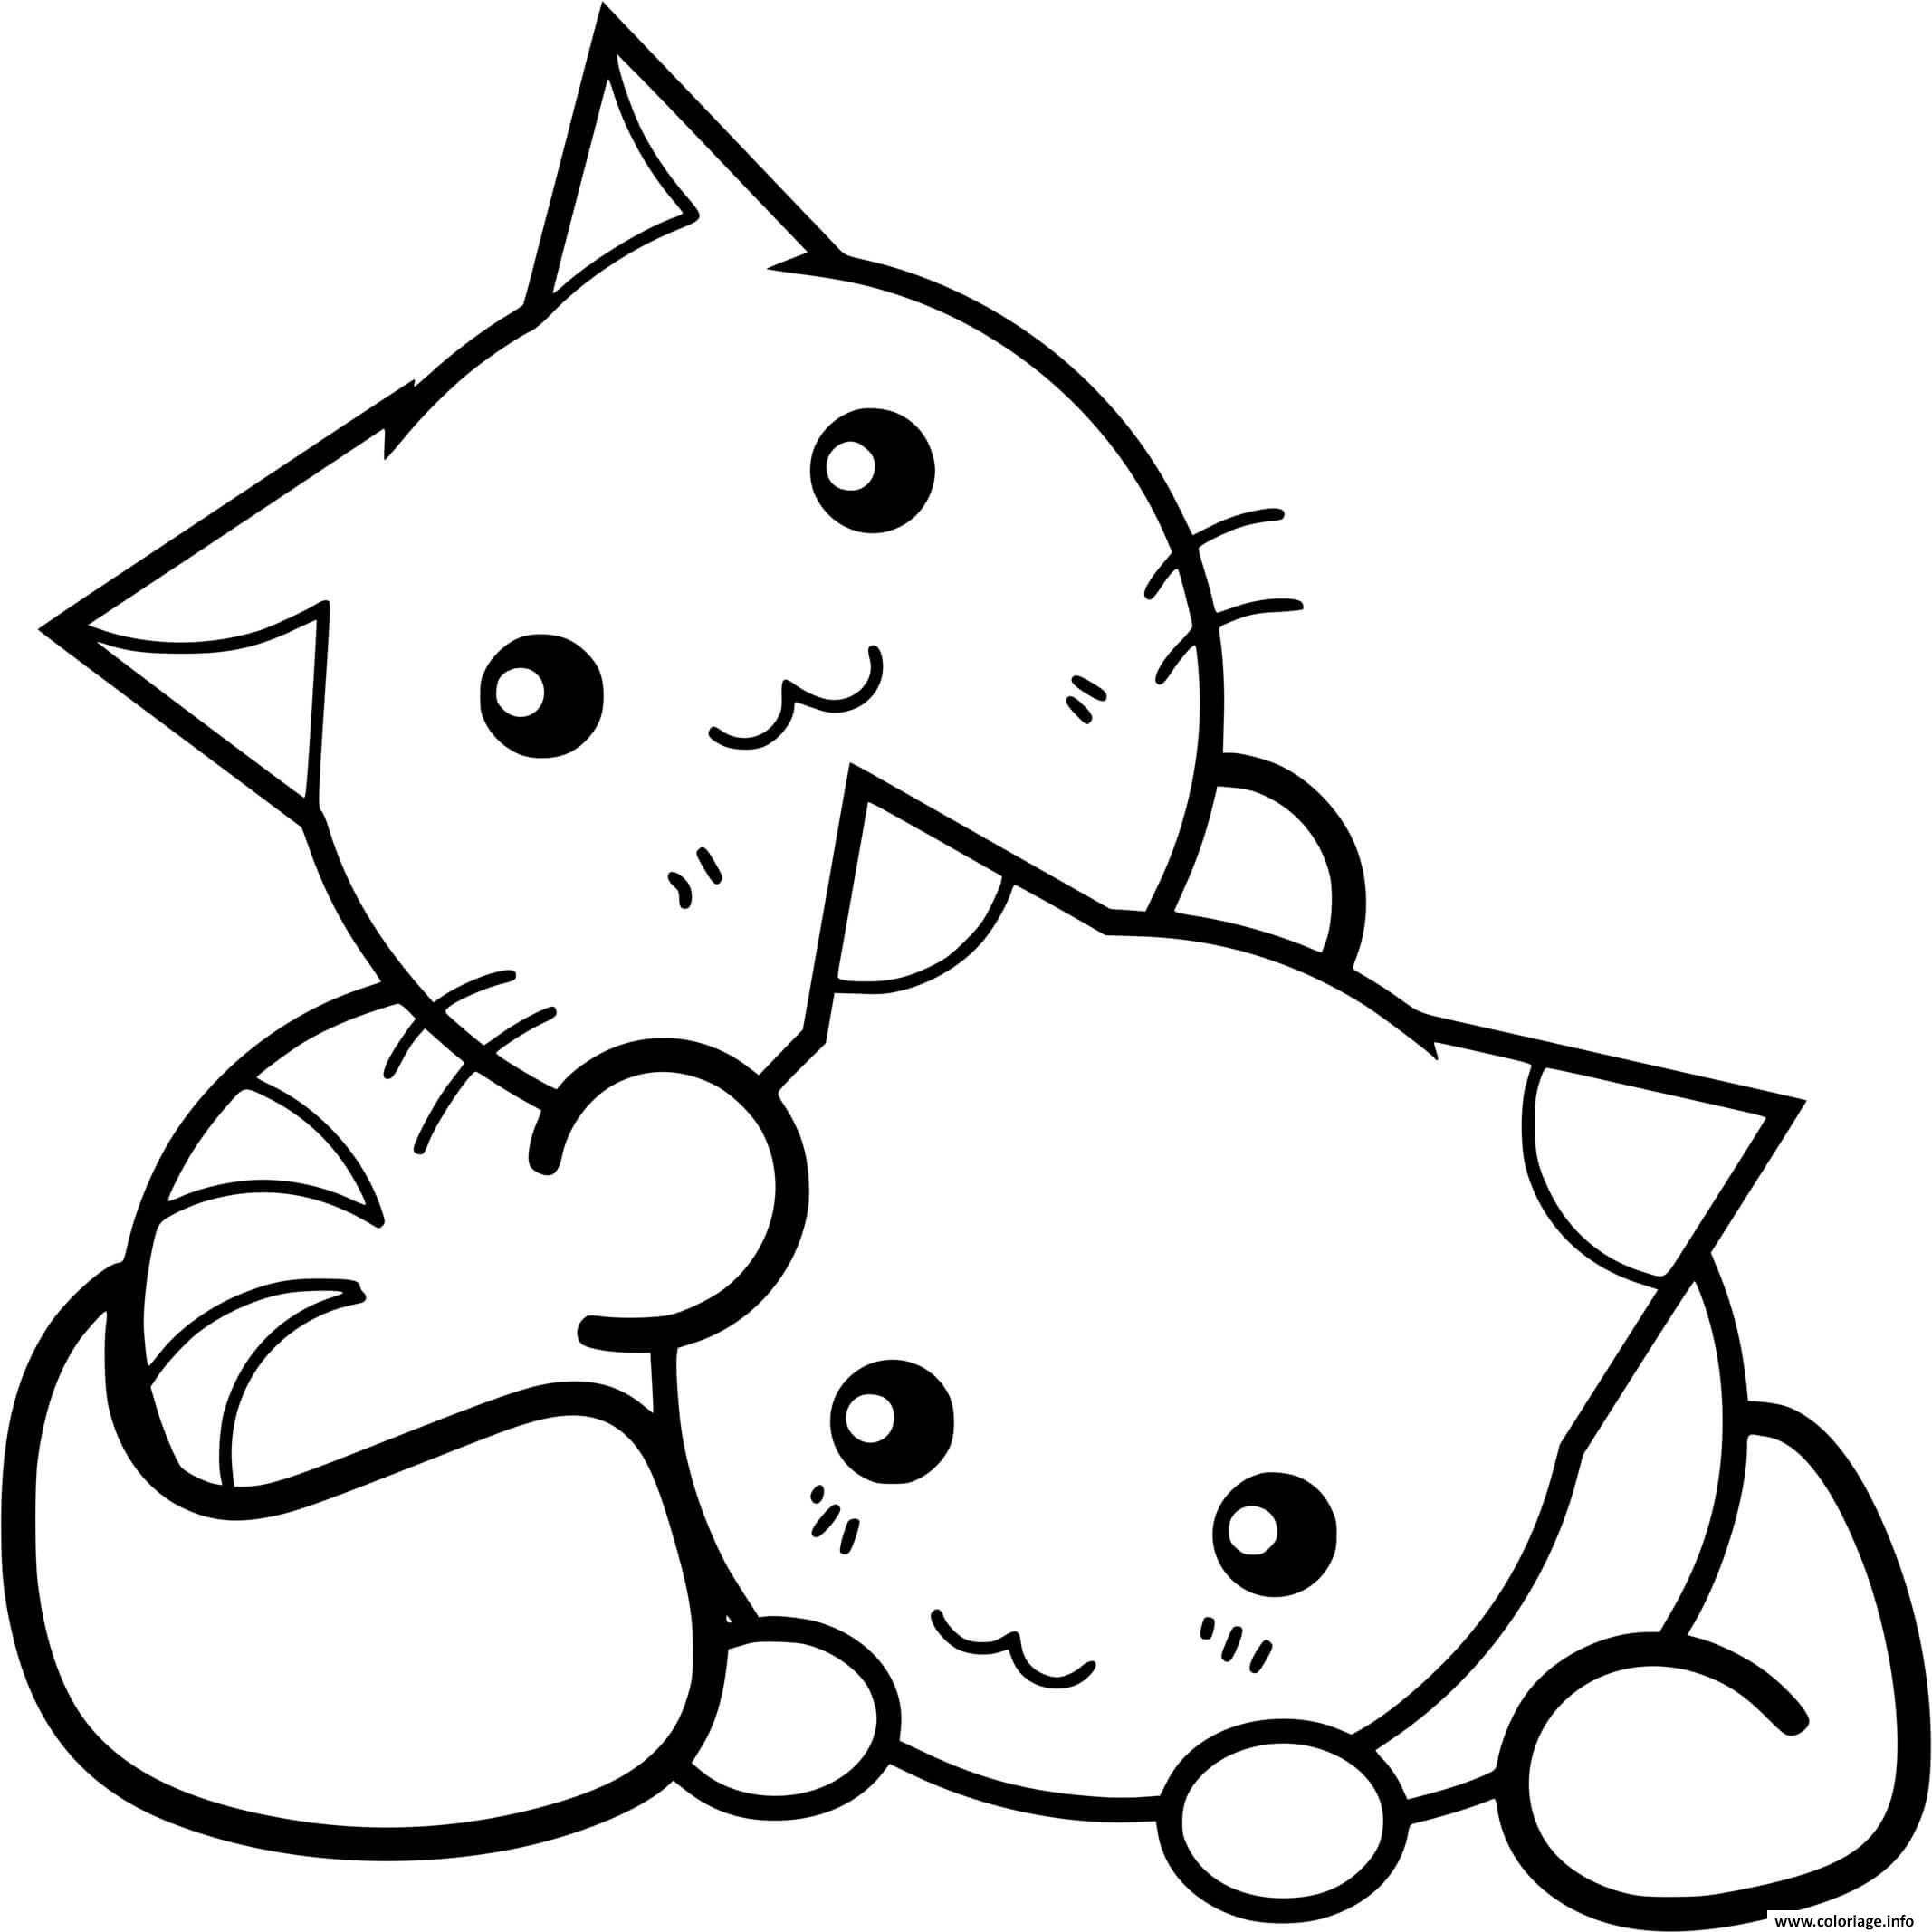 Coloriage Chaton Kawaii Mignon Dessin Chat à imprimer